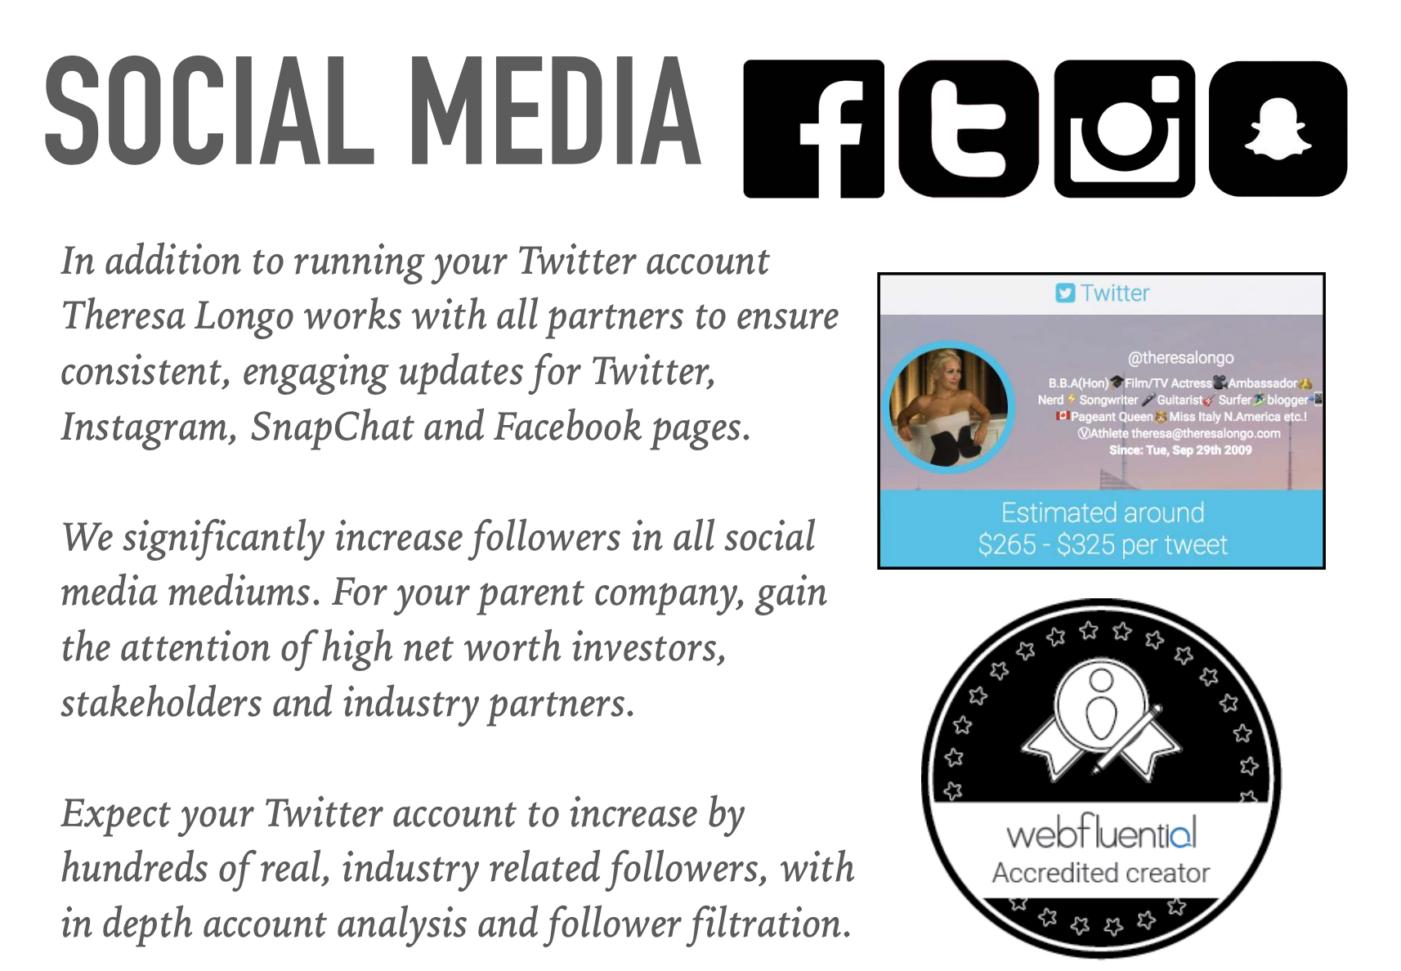 Theresa-Longo-Social-Media